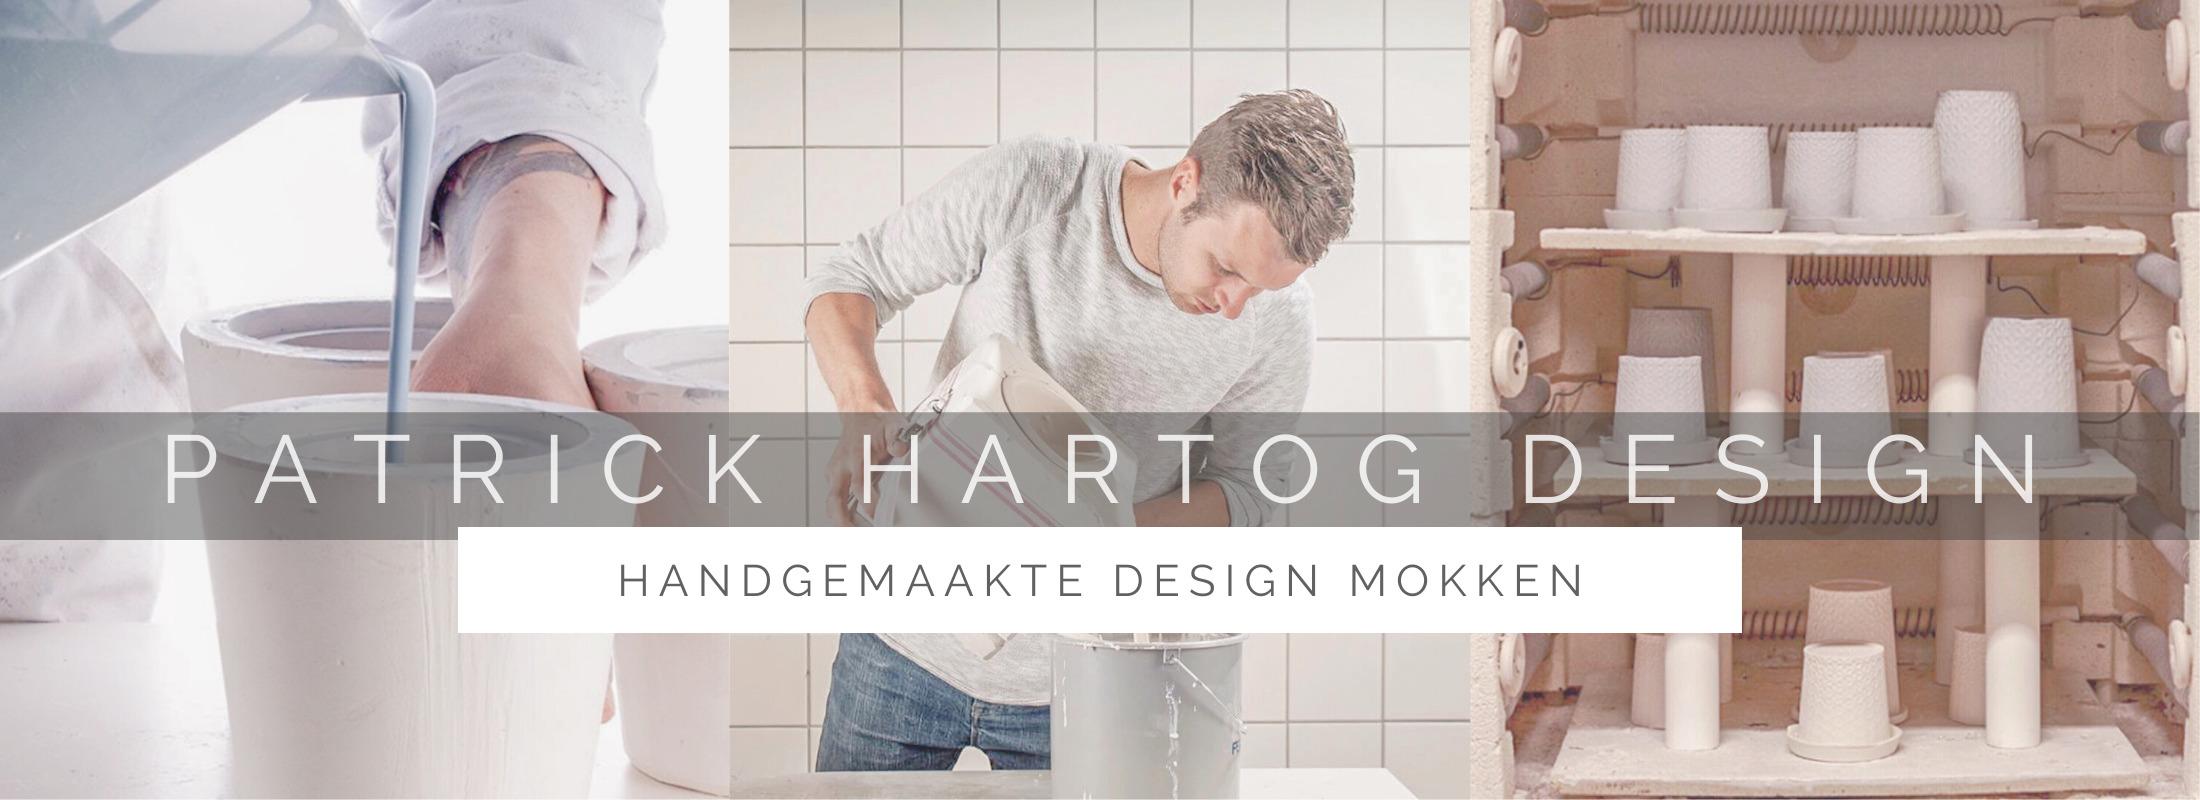 Patrick Hartog Design